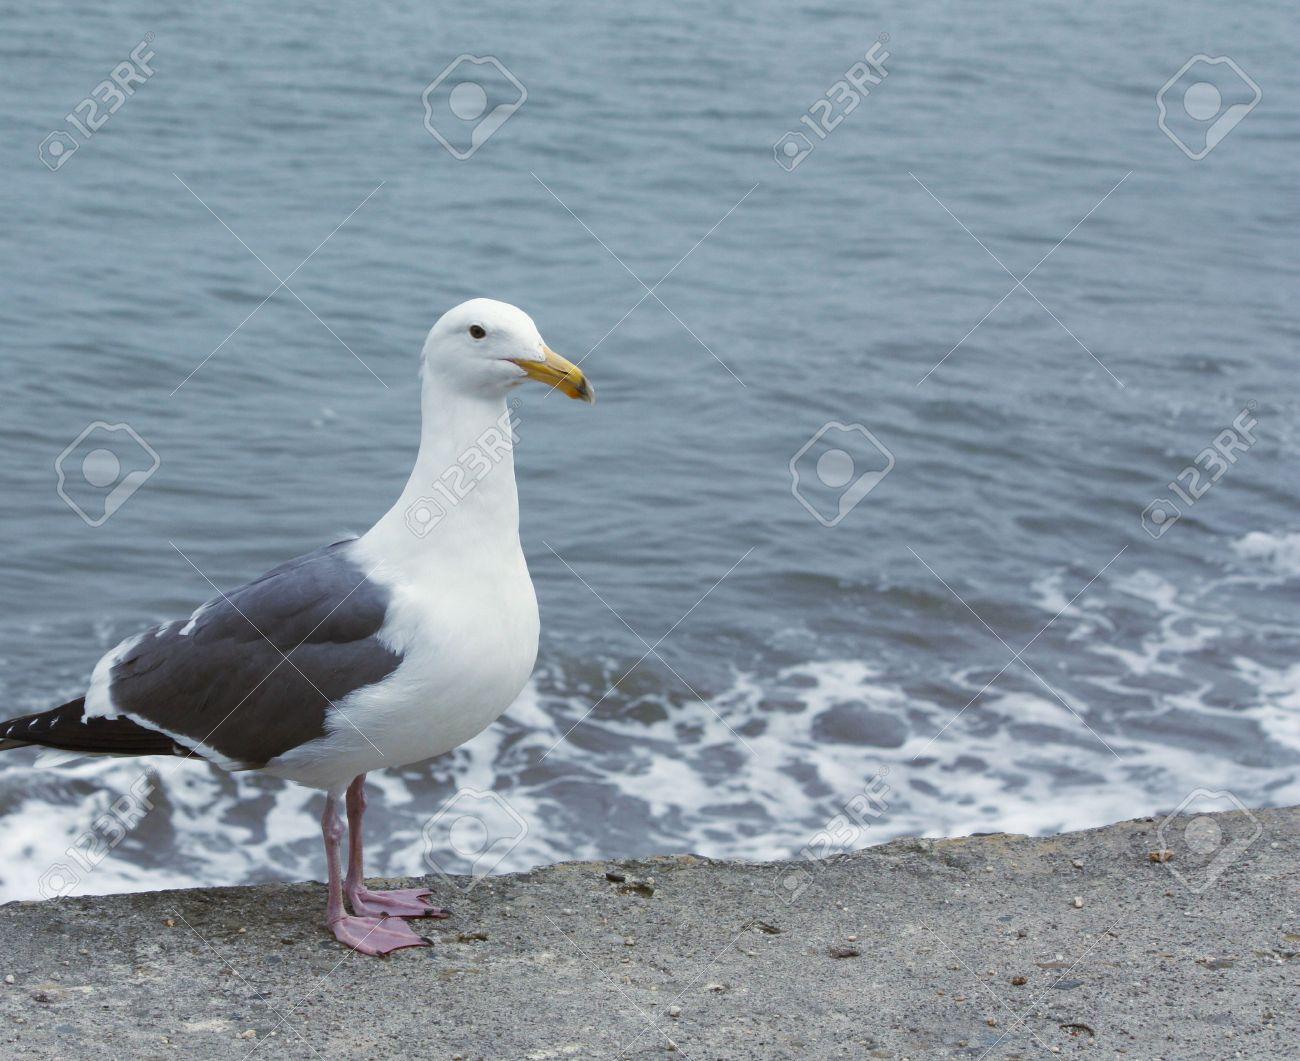 Sea gull by the sea Stock Photo - 6539993